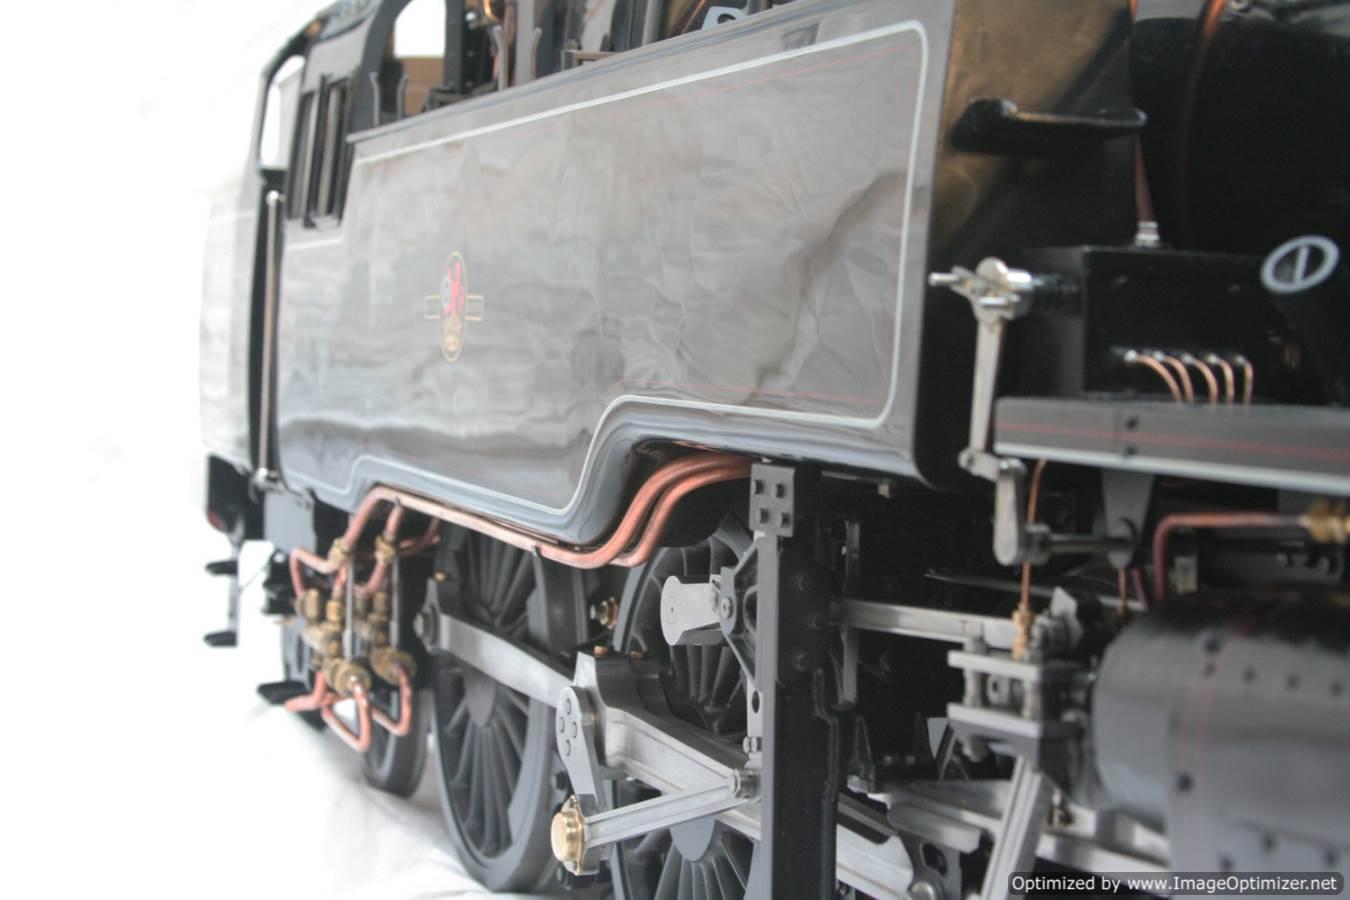 test br-standard-class-4-tank-live-steam-model-steam-workshop-rebuild-16-optimized